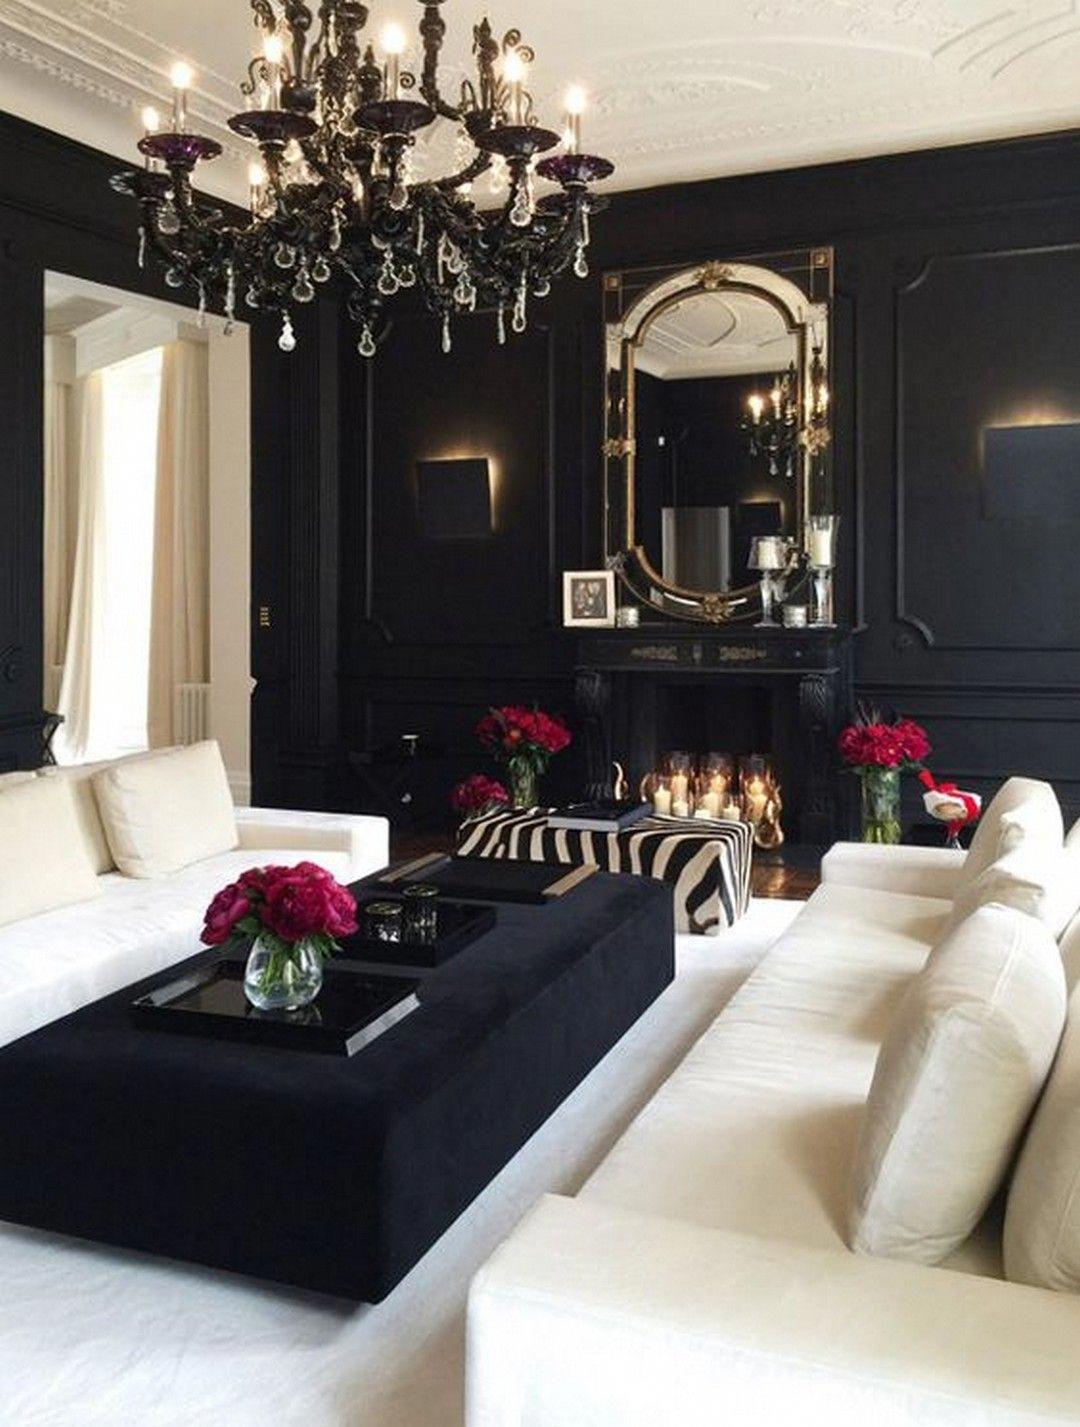 livingroomdesign with images modern glam living room on beautiful modern black white living room inspired id=19730